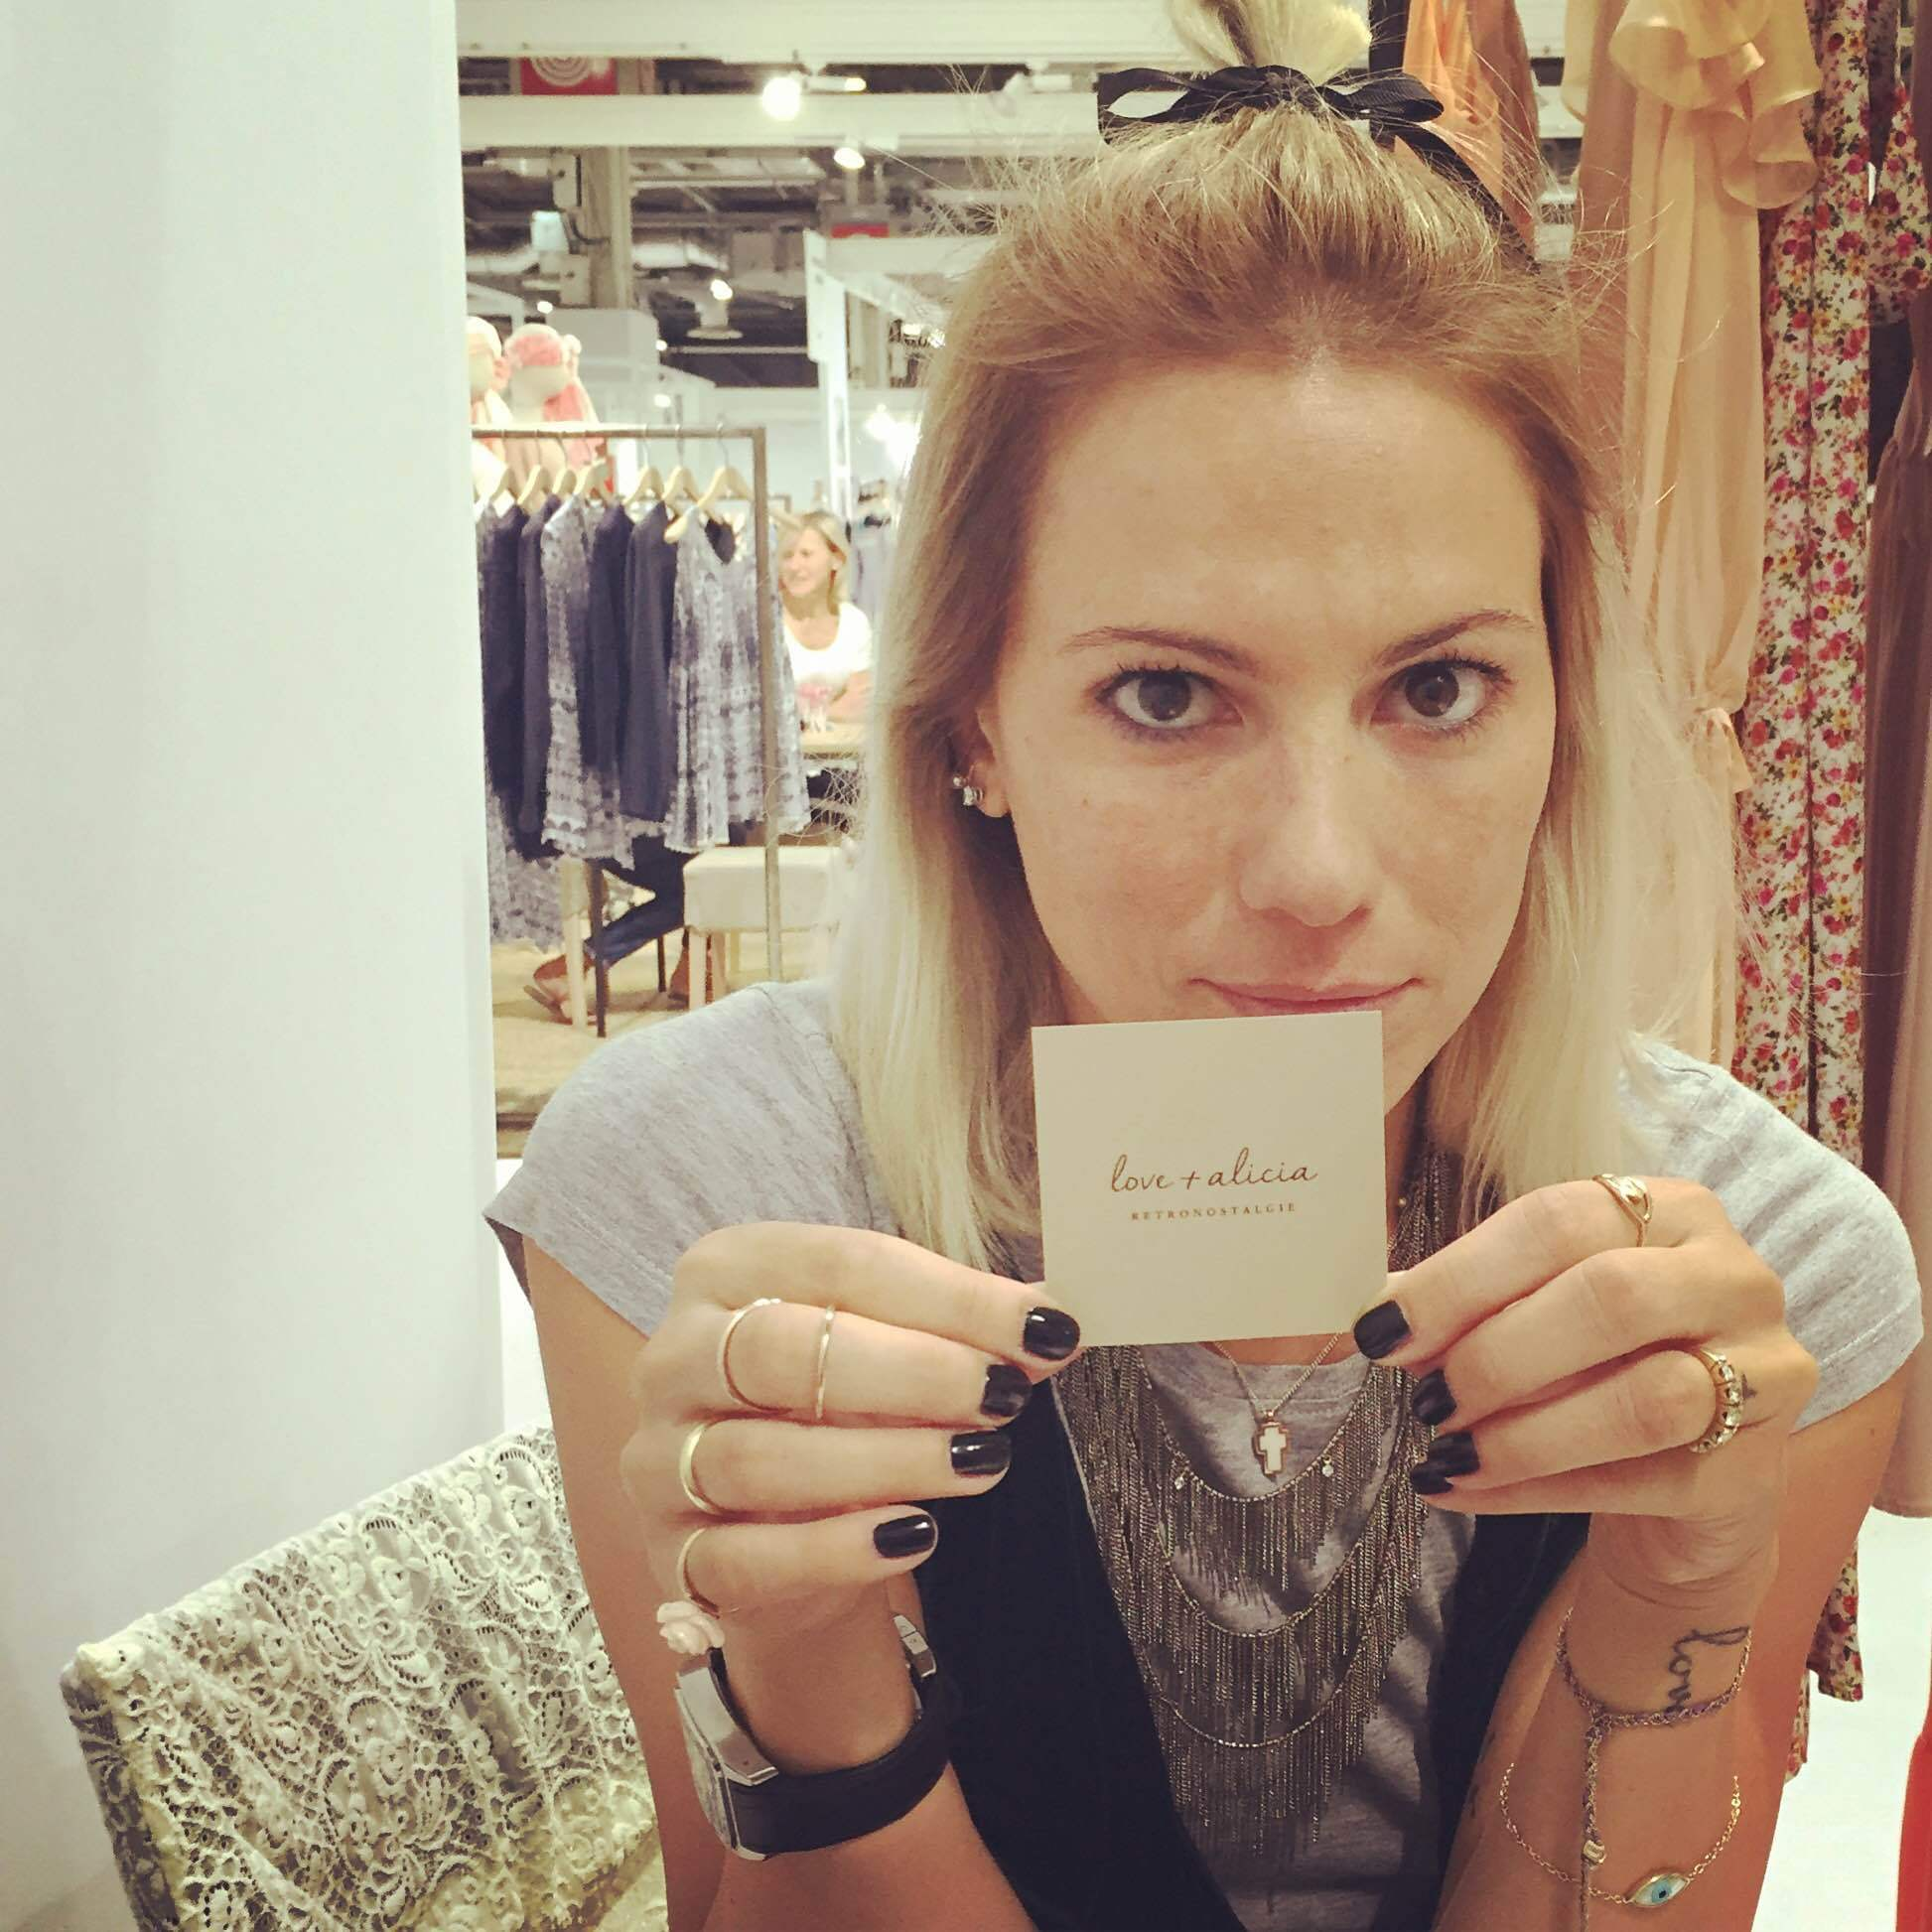 b444cf48c359 Love and Alicia  Η ελληνική εταιρεία που δημιουργεί ρούχα βγαλμένα ...